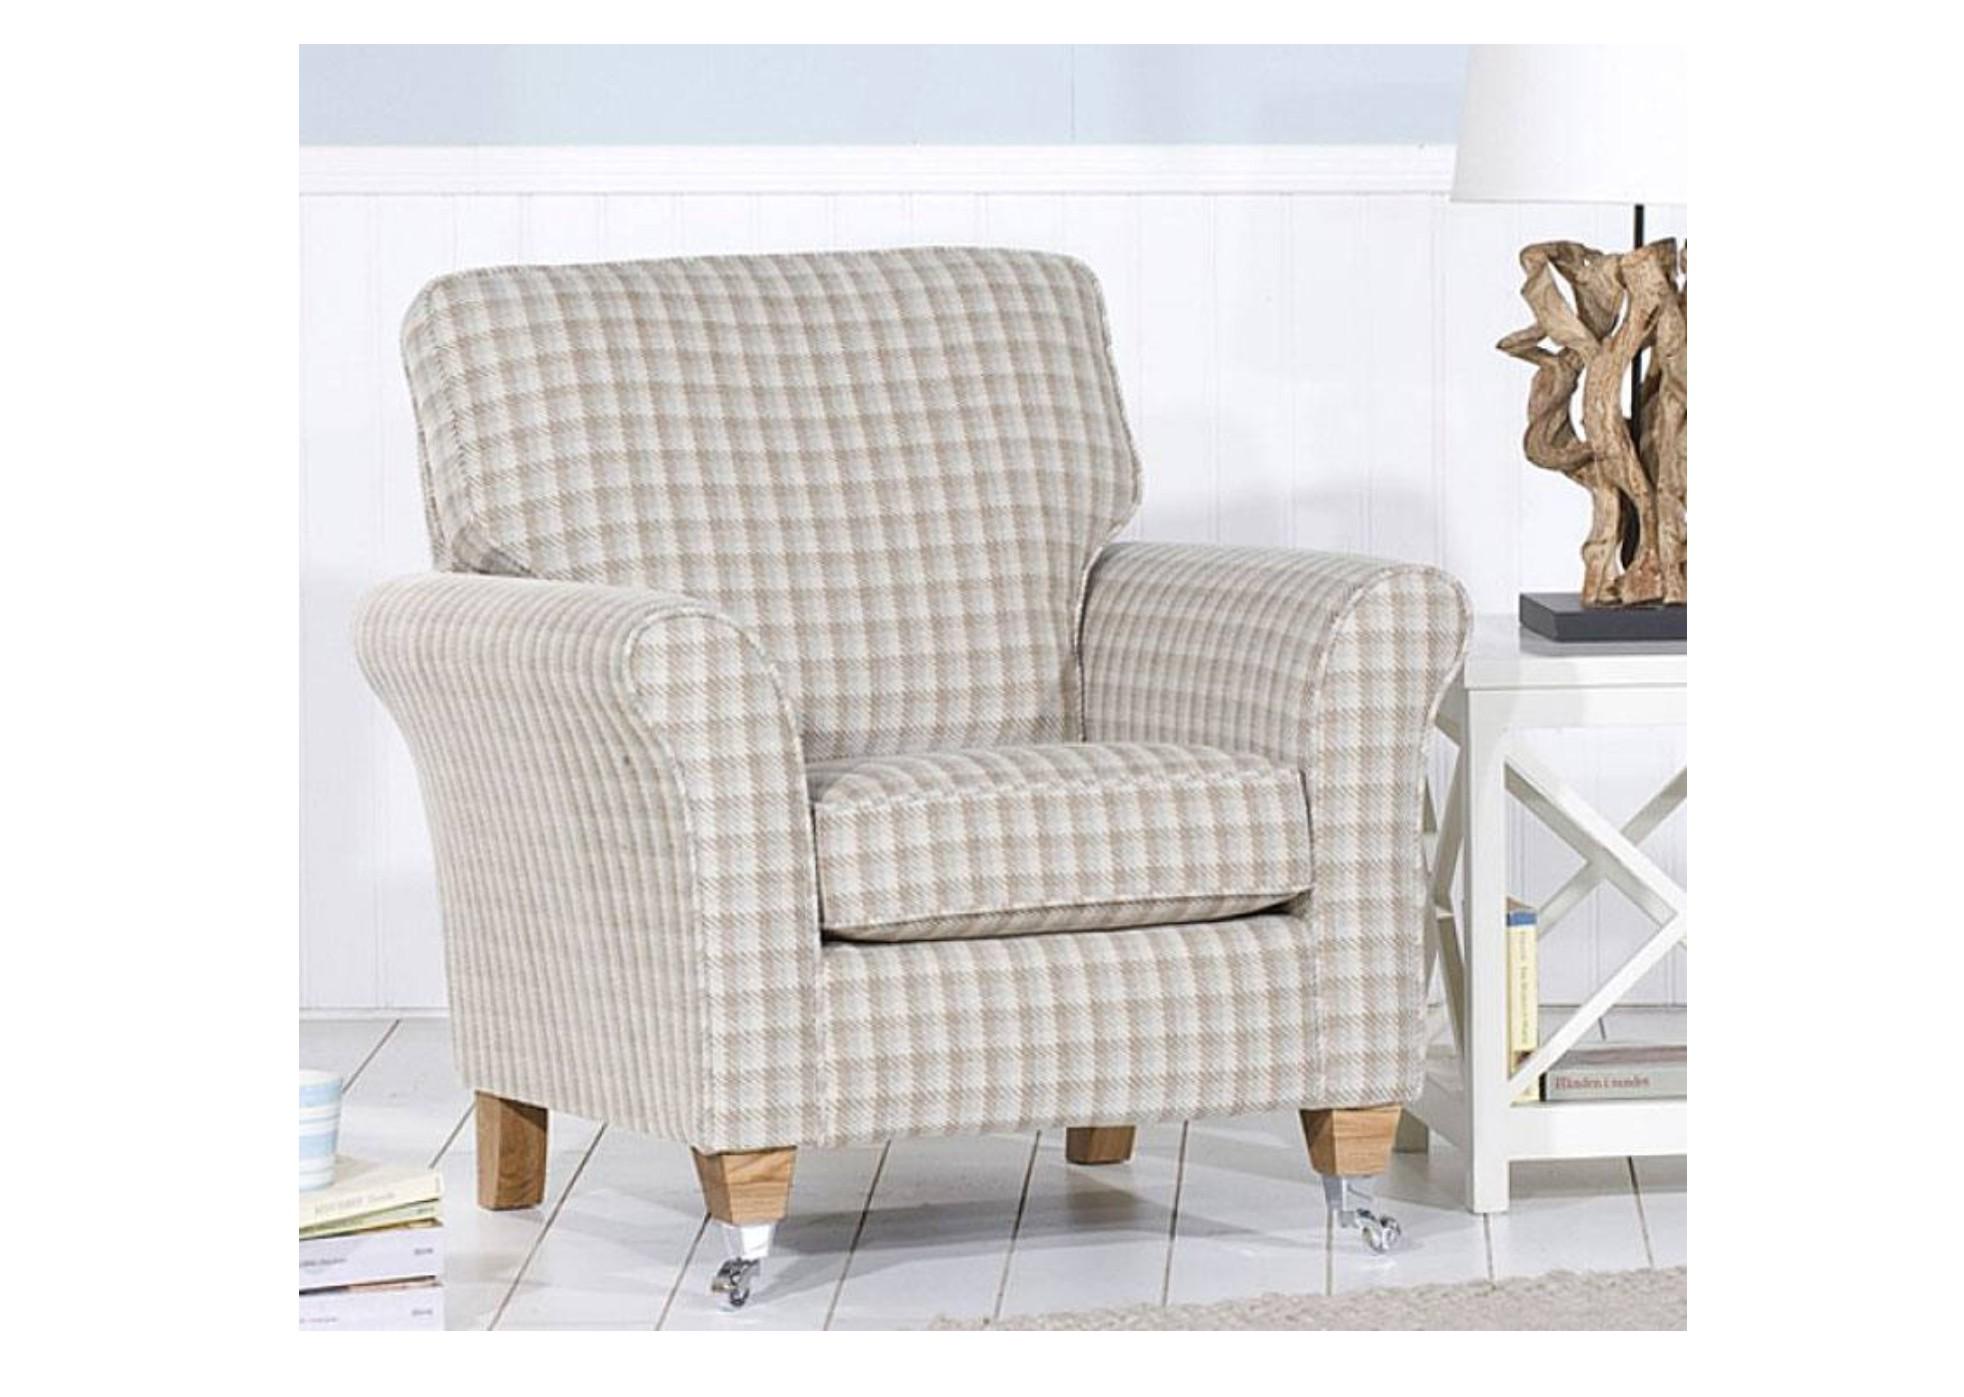 Vermont Accent Chair